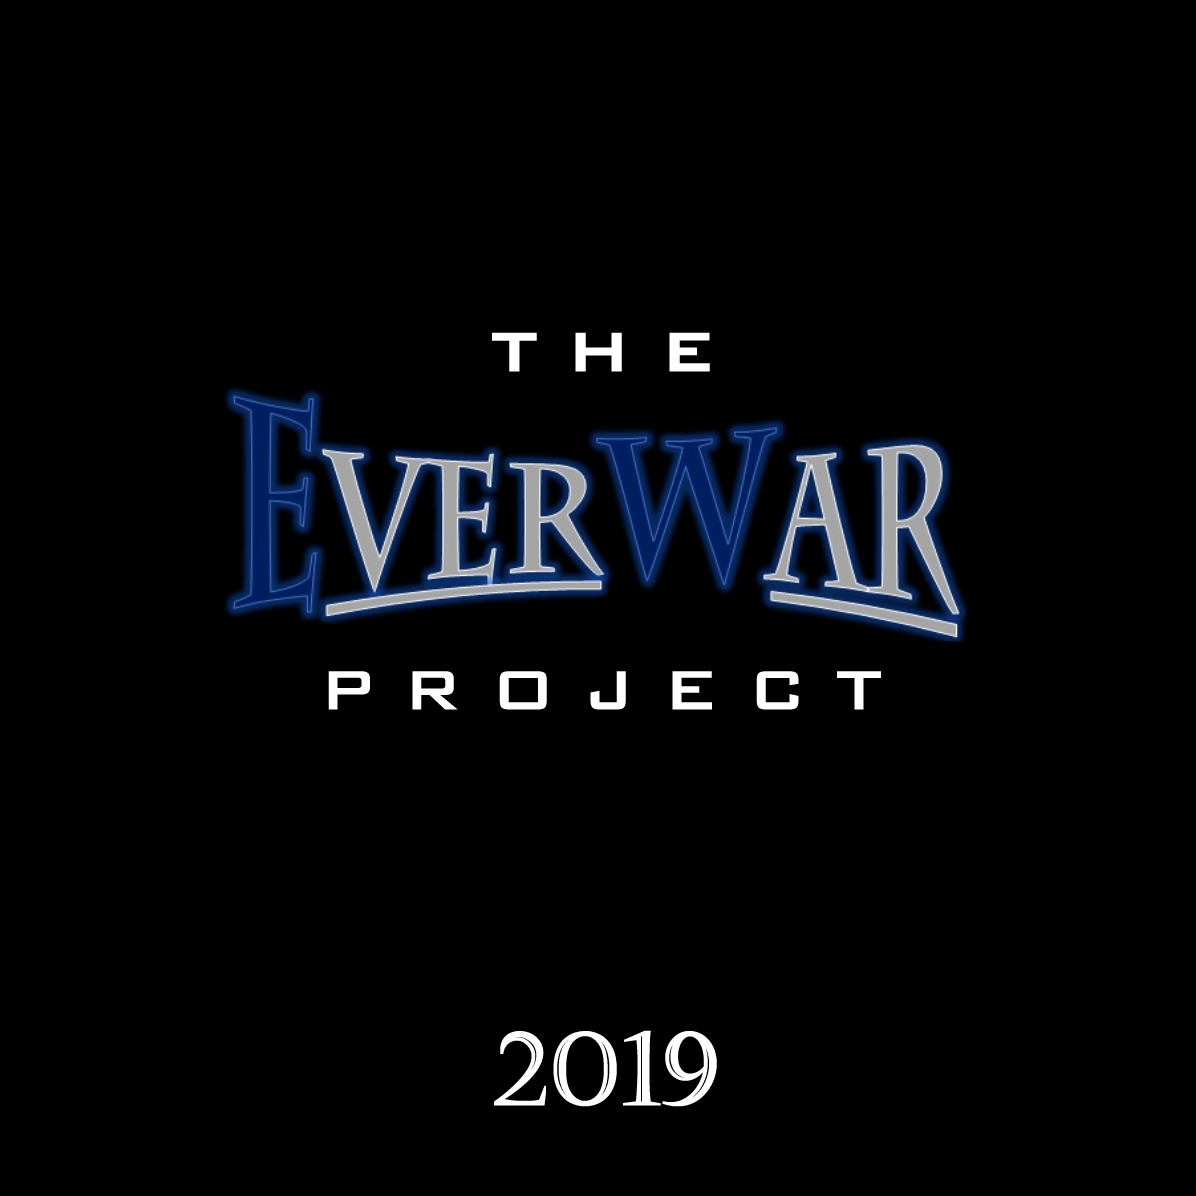 The EverWar Project Teaser.png